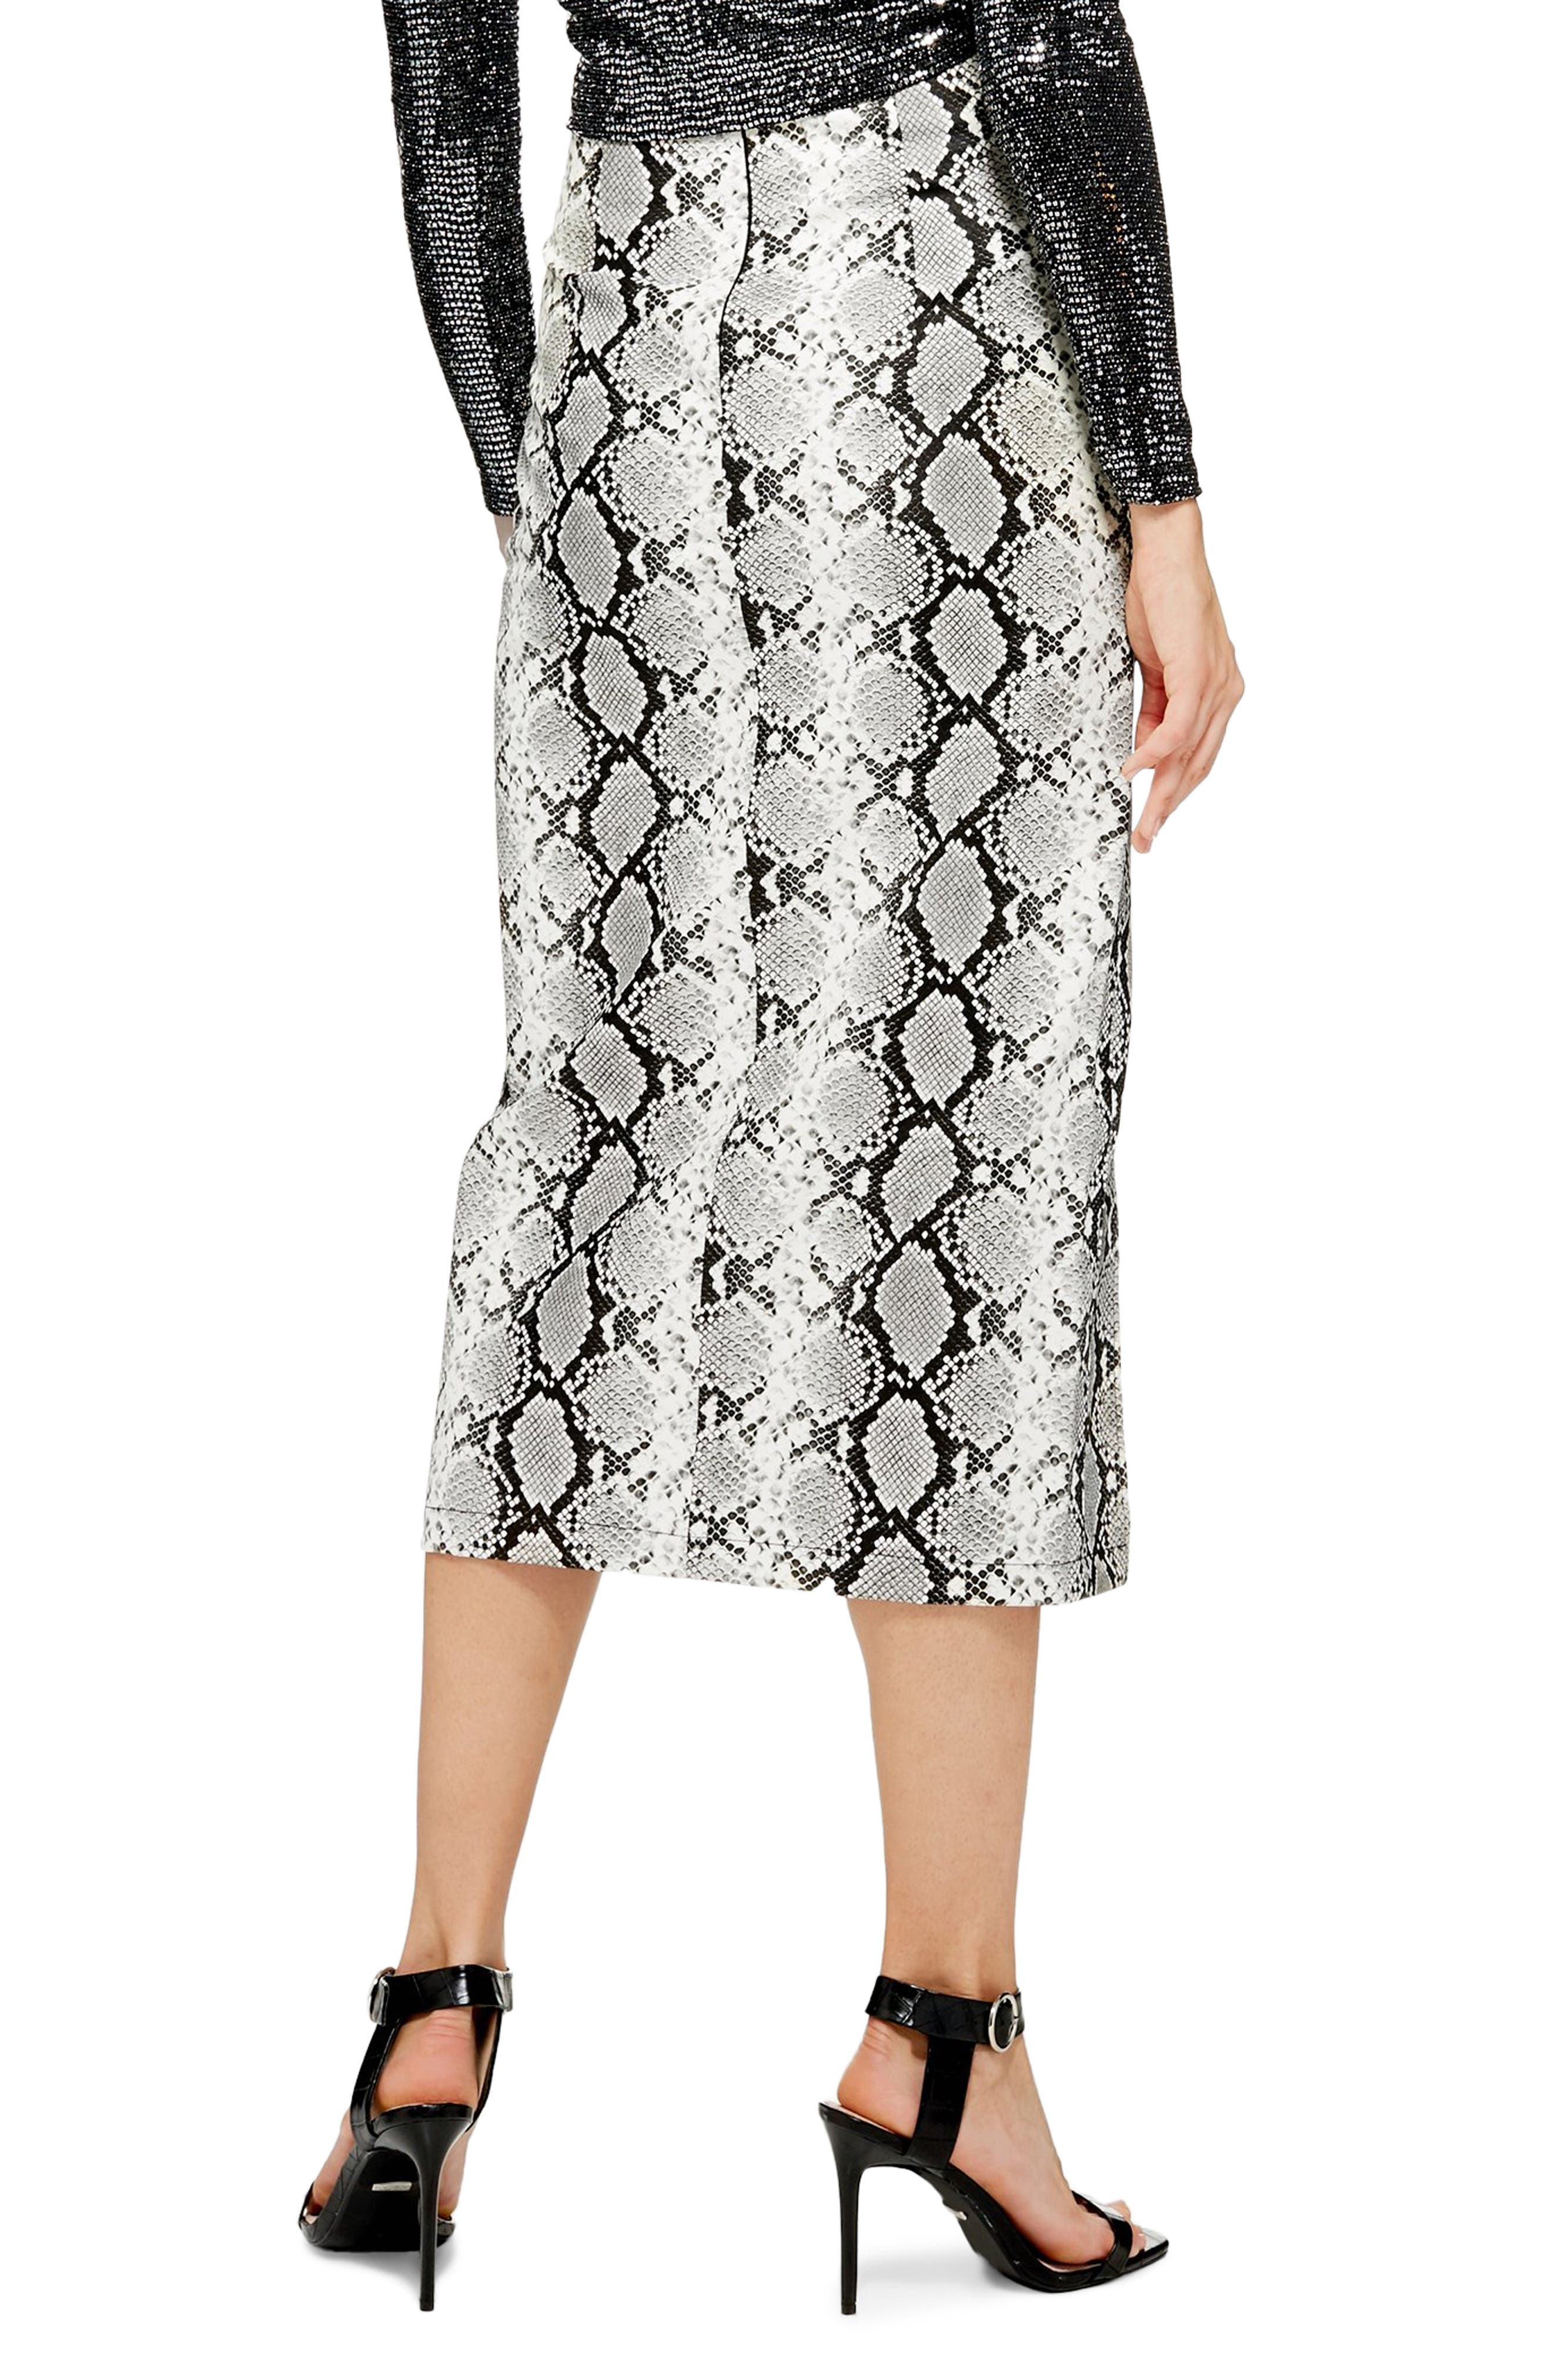 TOPSHOP, Snake Print Faux Leather Midi Skirt, Alternate thumbnail 2, color, 002